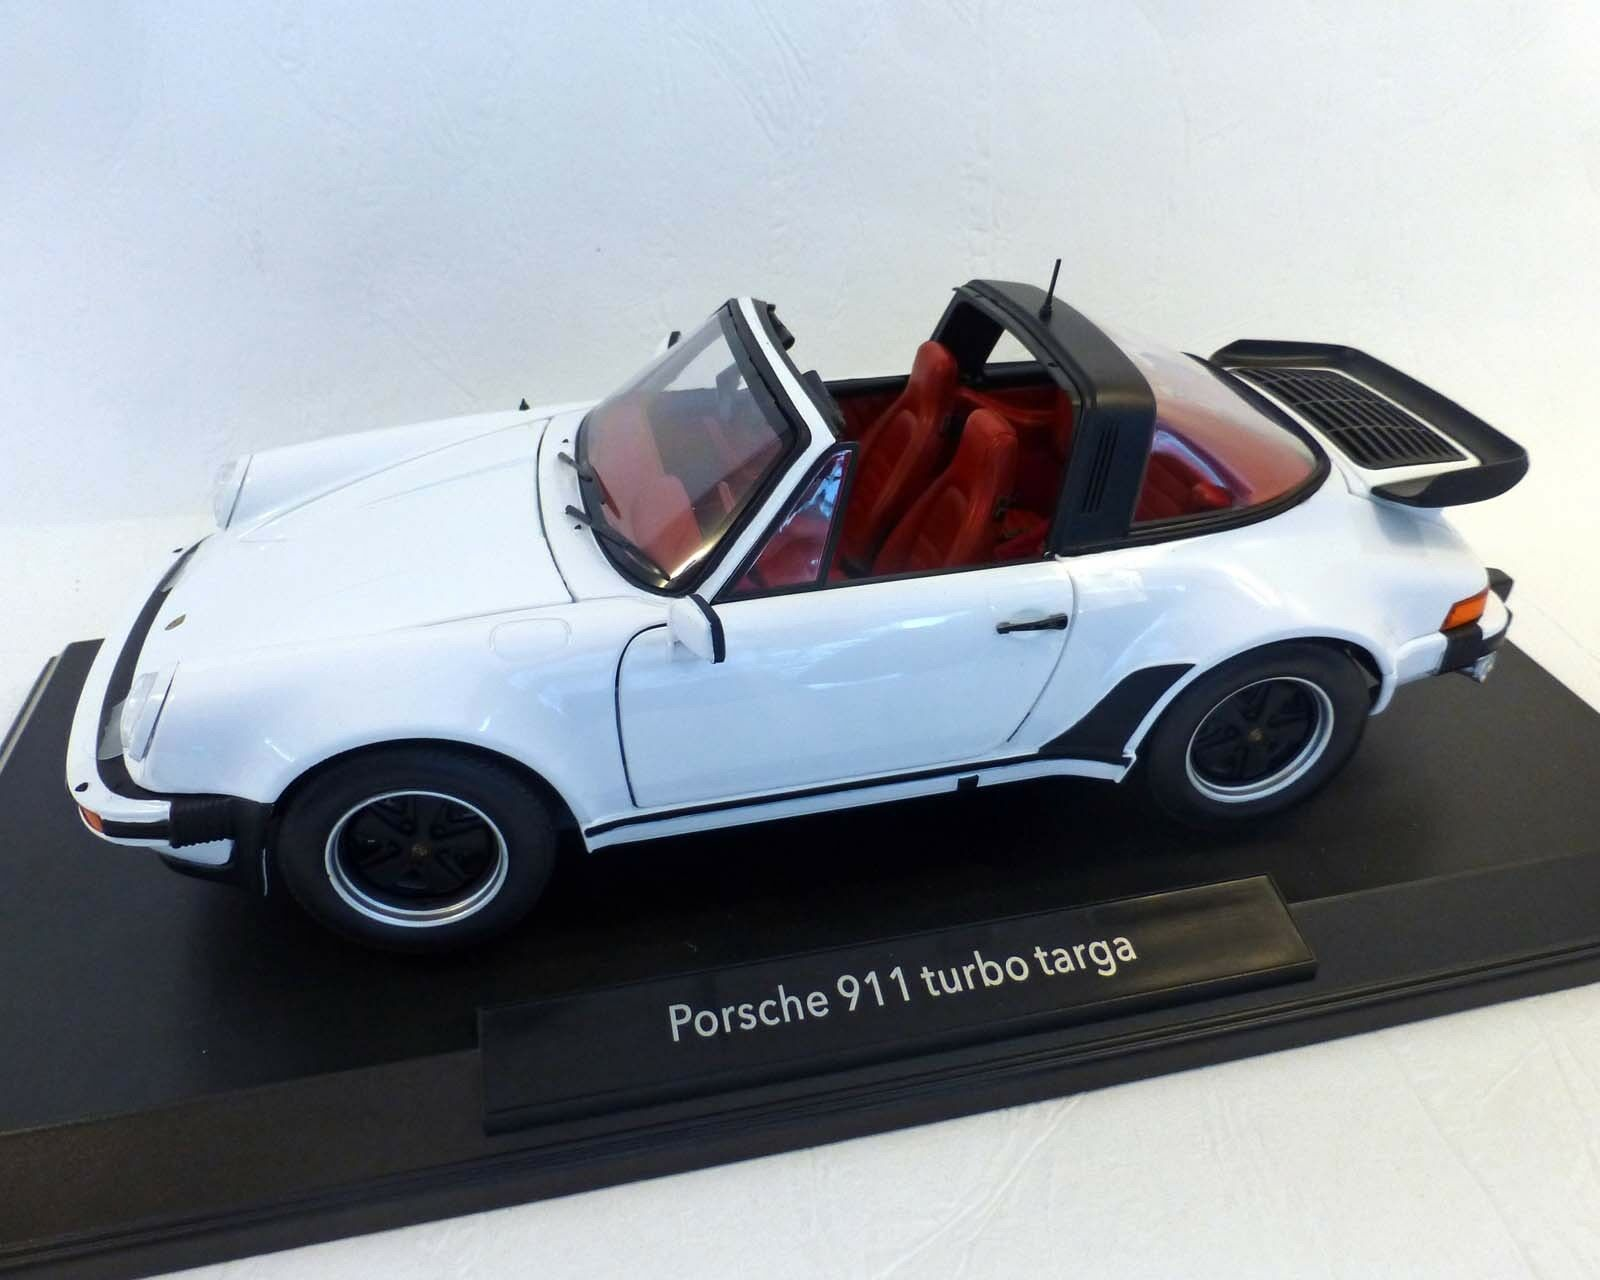 PORSCHE 911 turbo Targa 3,3 - Blanc, 1987, Norev 1 18